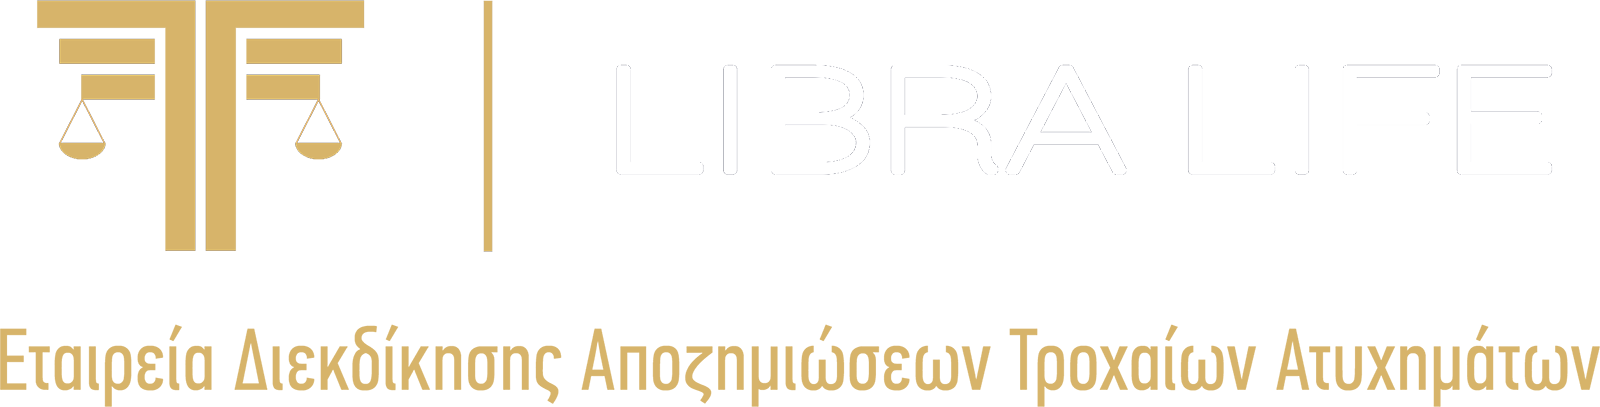 Libra Life - Αποζημίωση τροχαίων ατυχημάτων